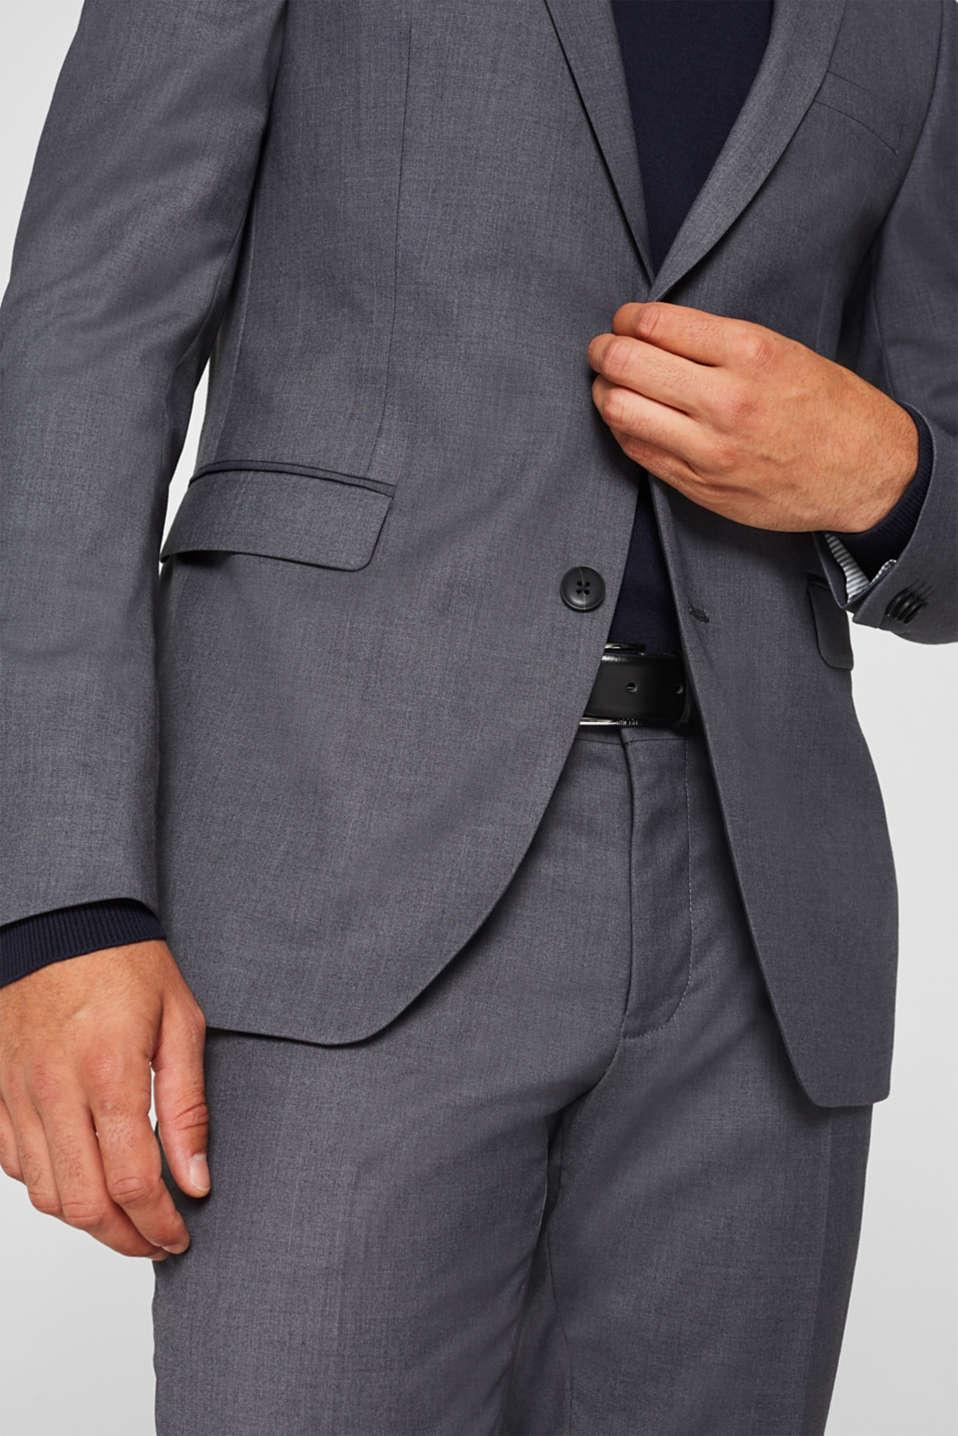 Blazers suit, GREY, detail image number 2